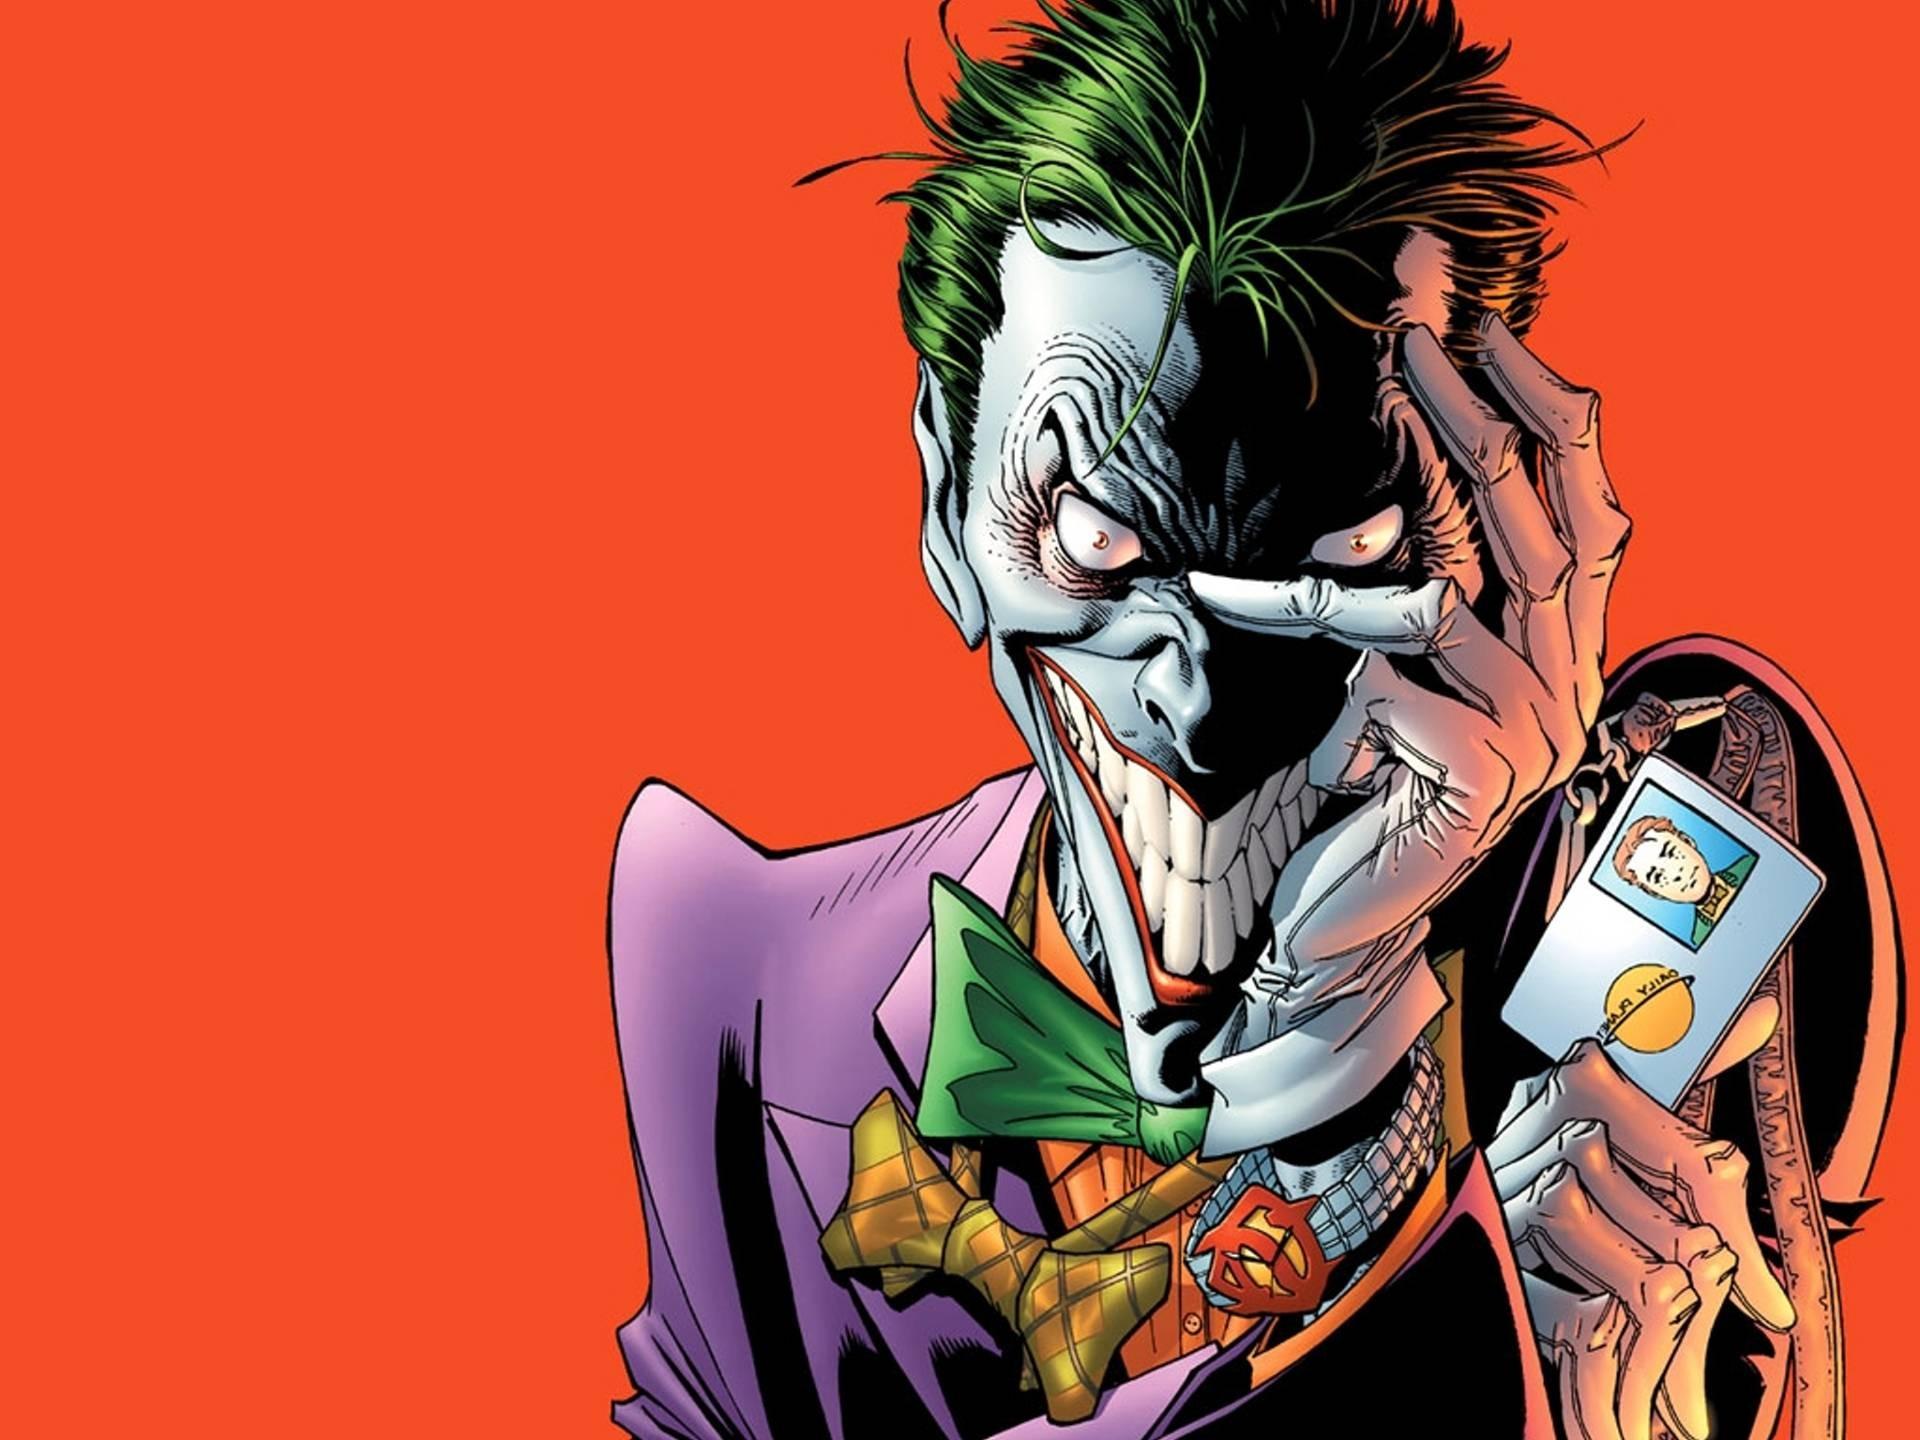 Joker desktop wallpaper 1920x1440